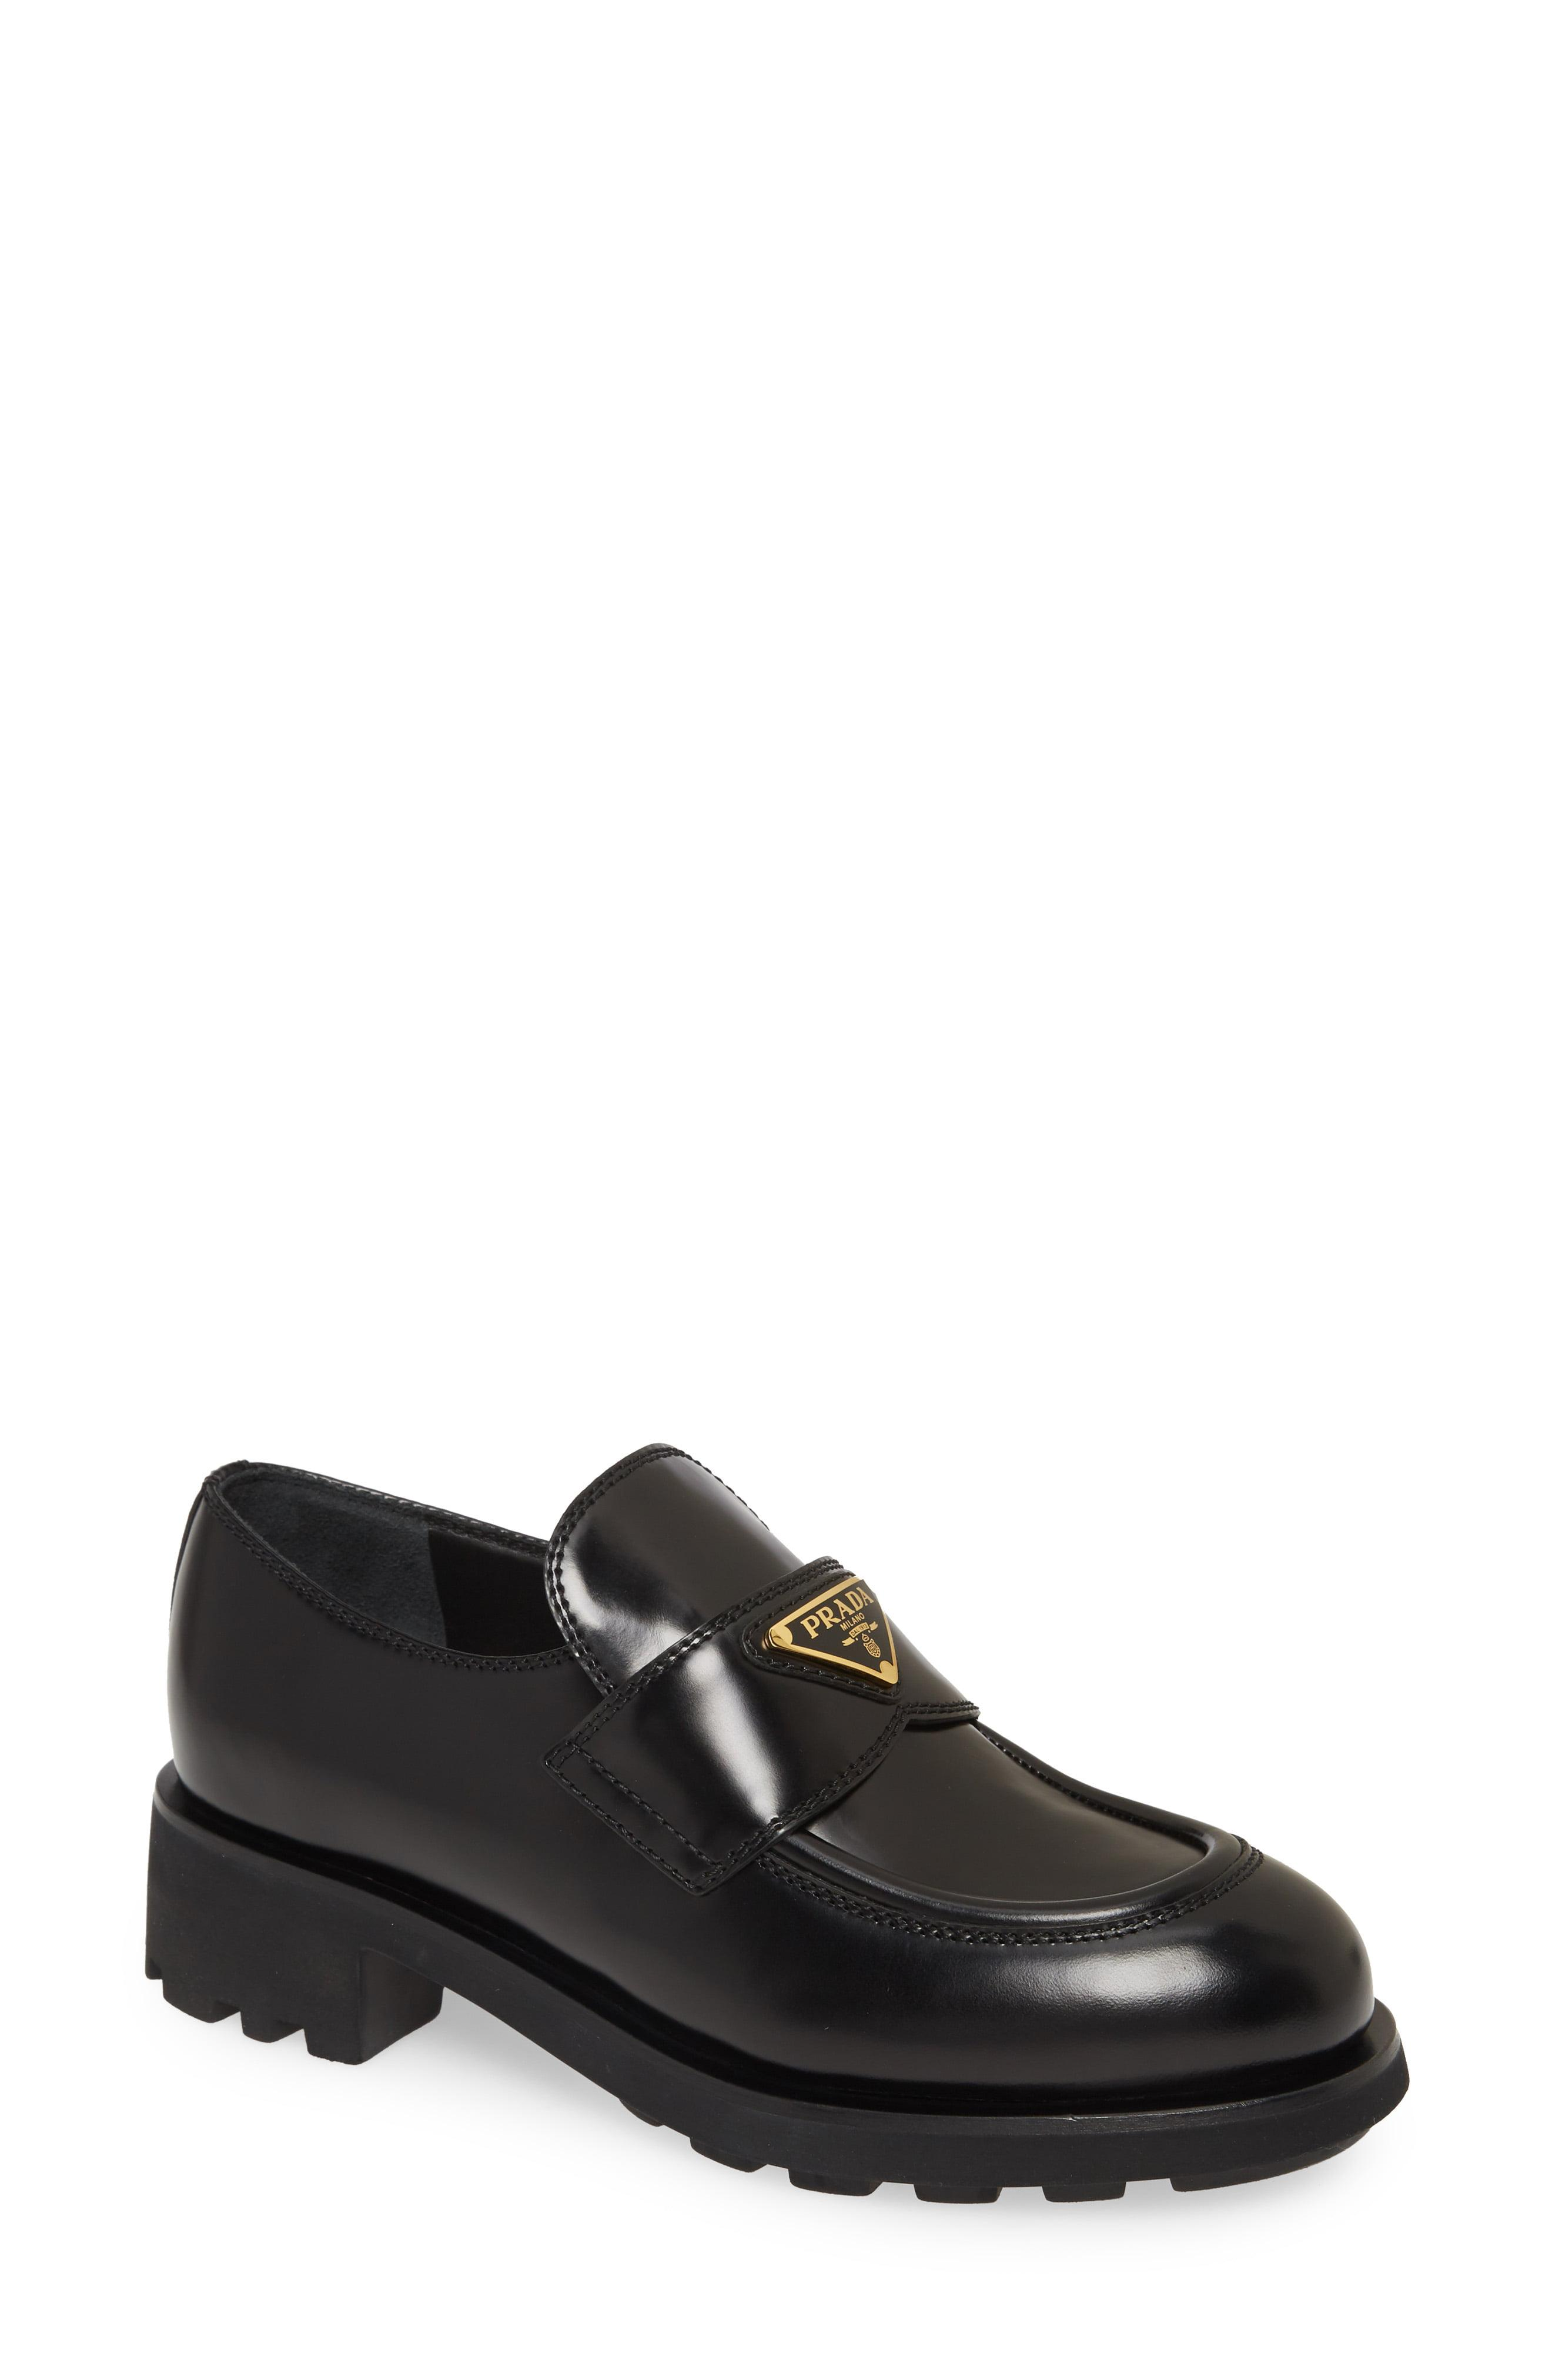 Prada Logo Block Heel Penny Loafer in Black - Lyst